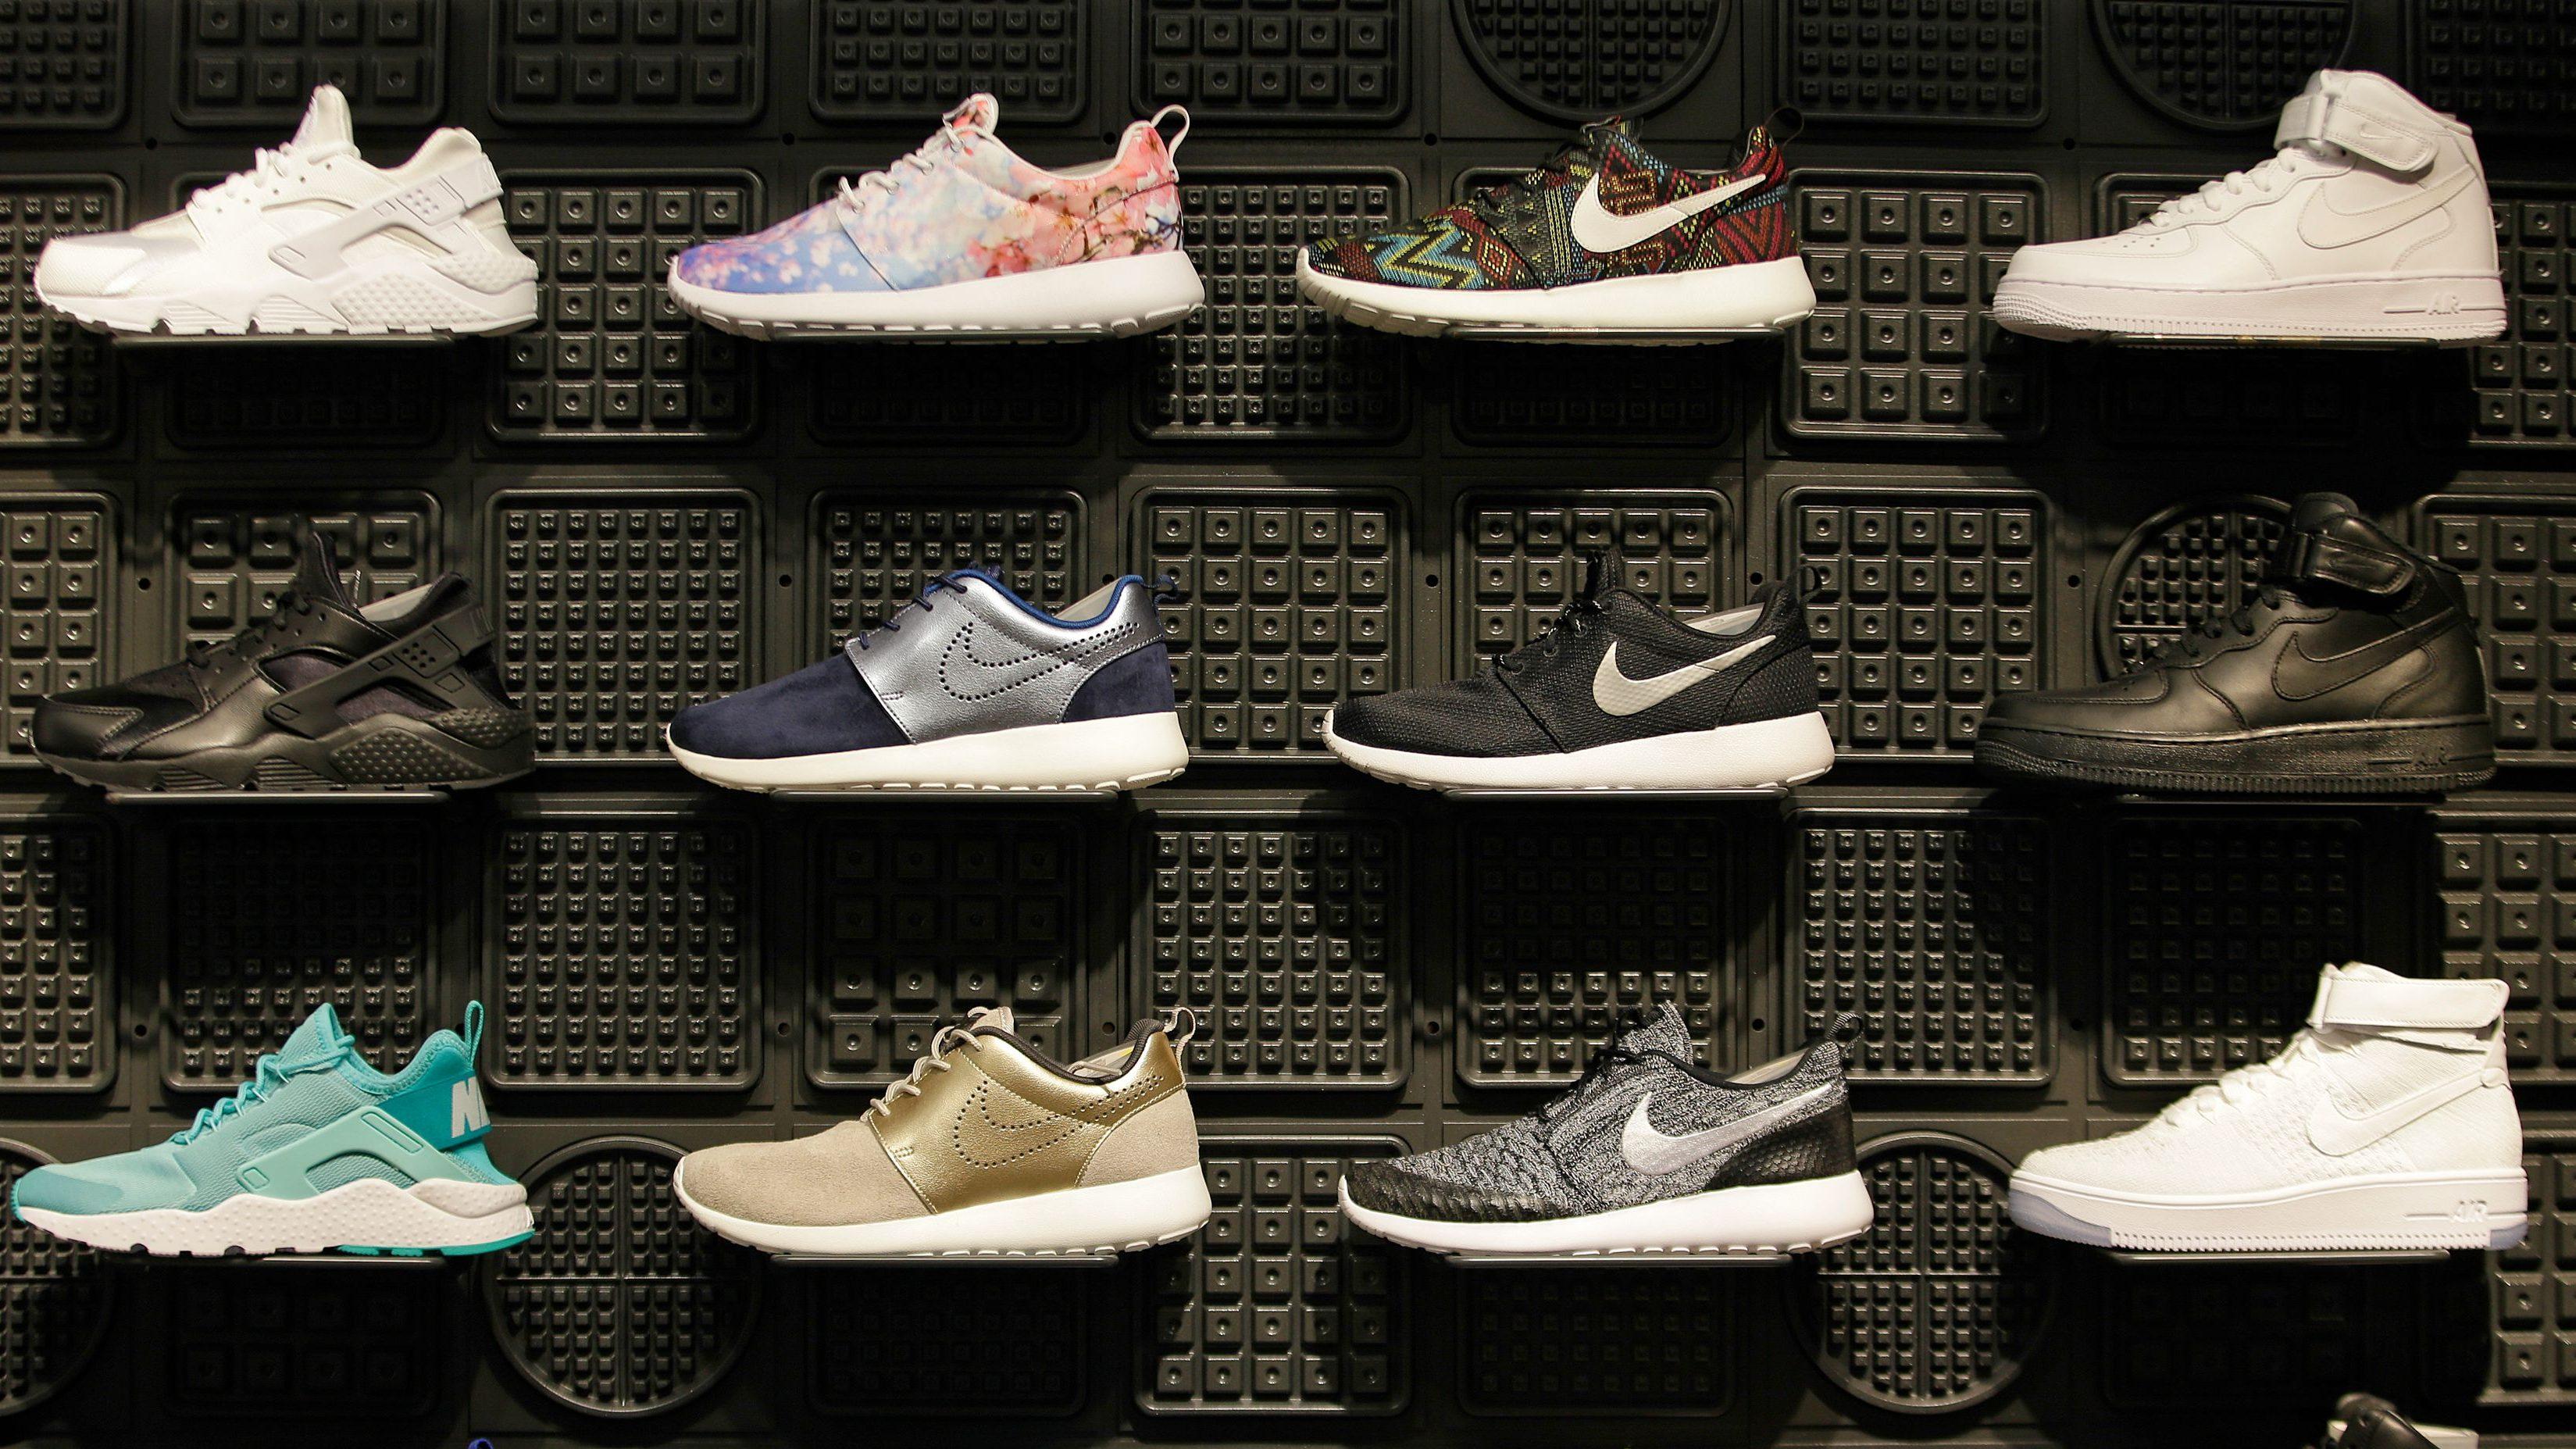 best service 3cc03 047dd Nike is focusing on sneaker innovation in the under- 100 range